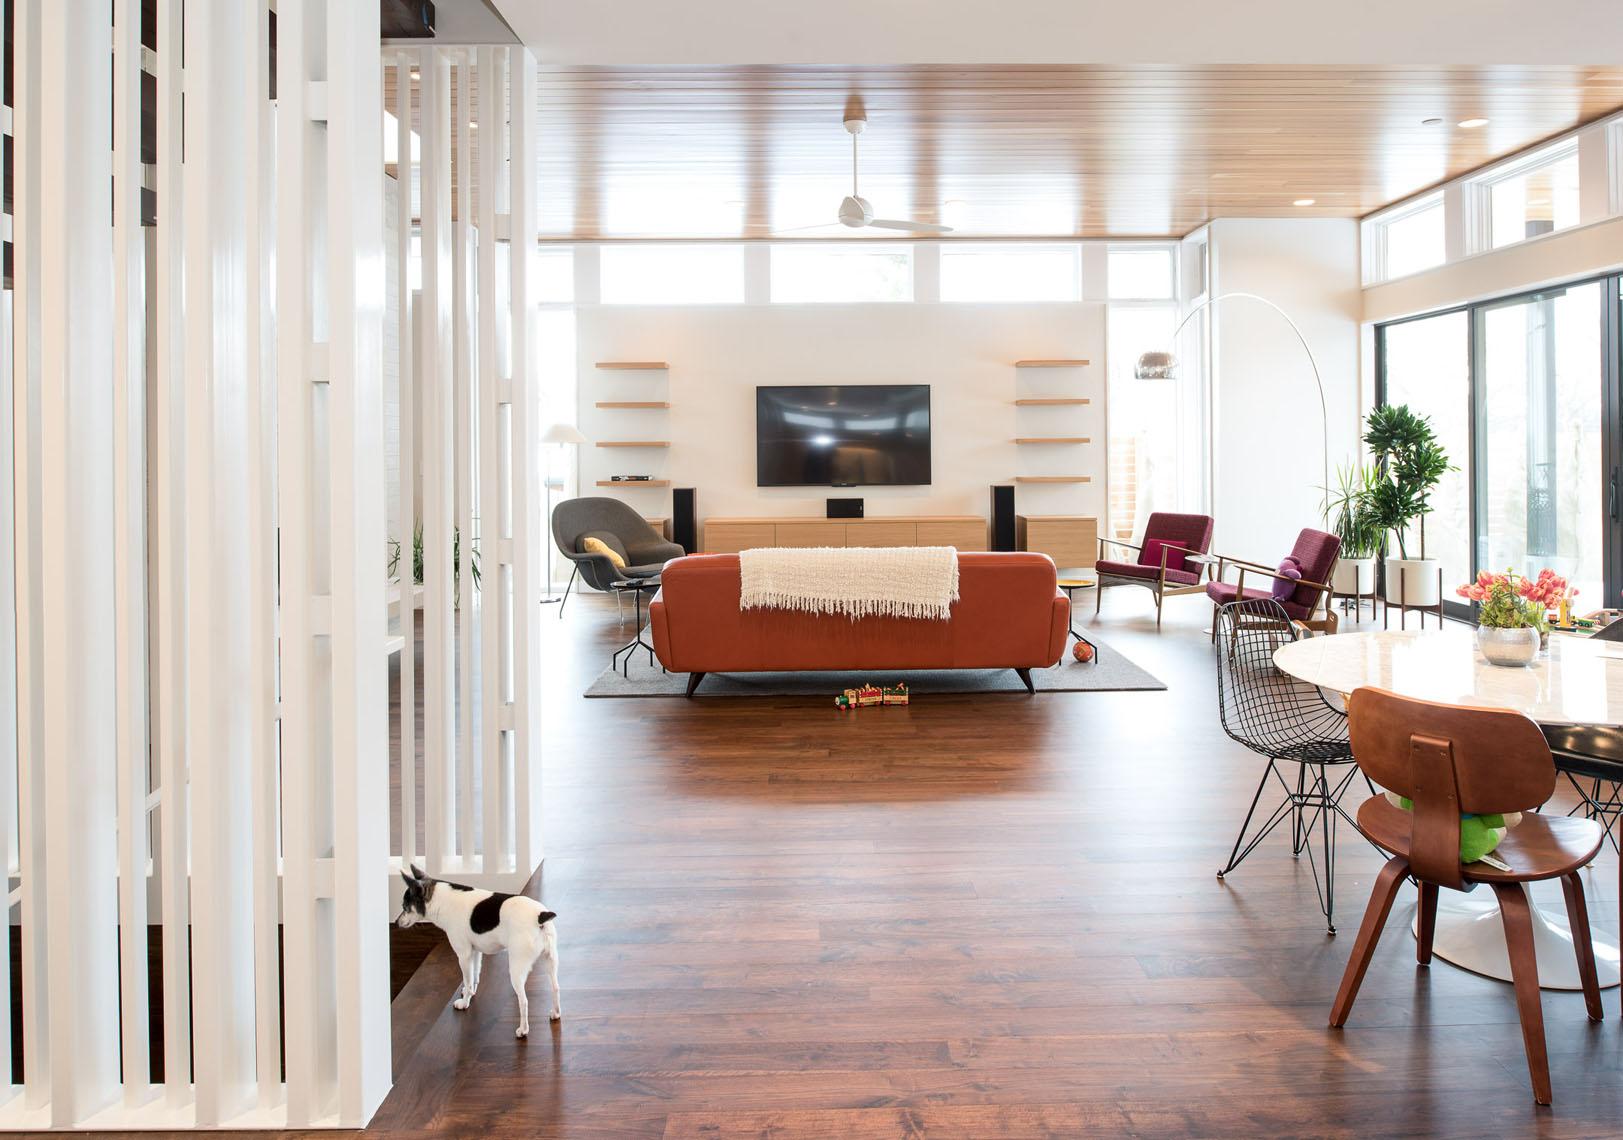 Modern living room in an open floorplan